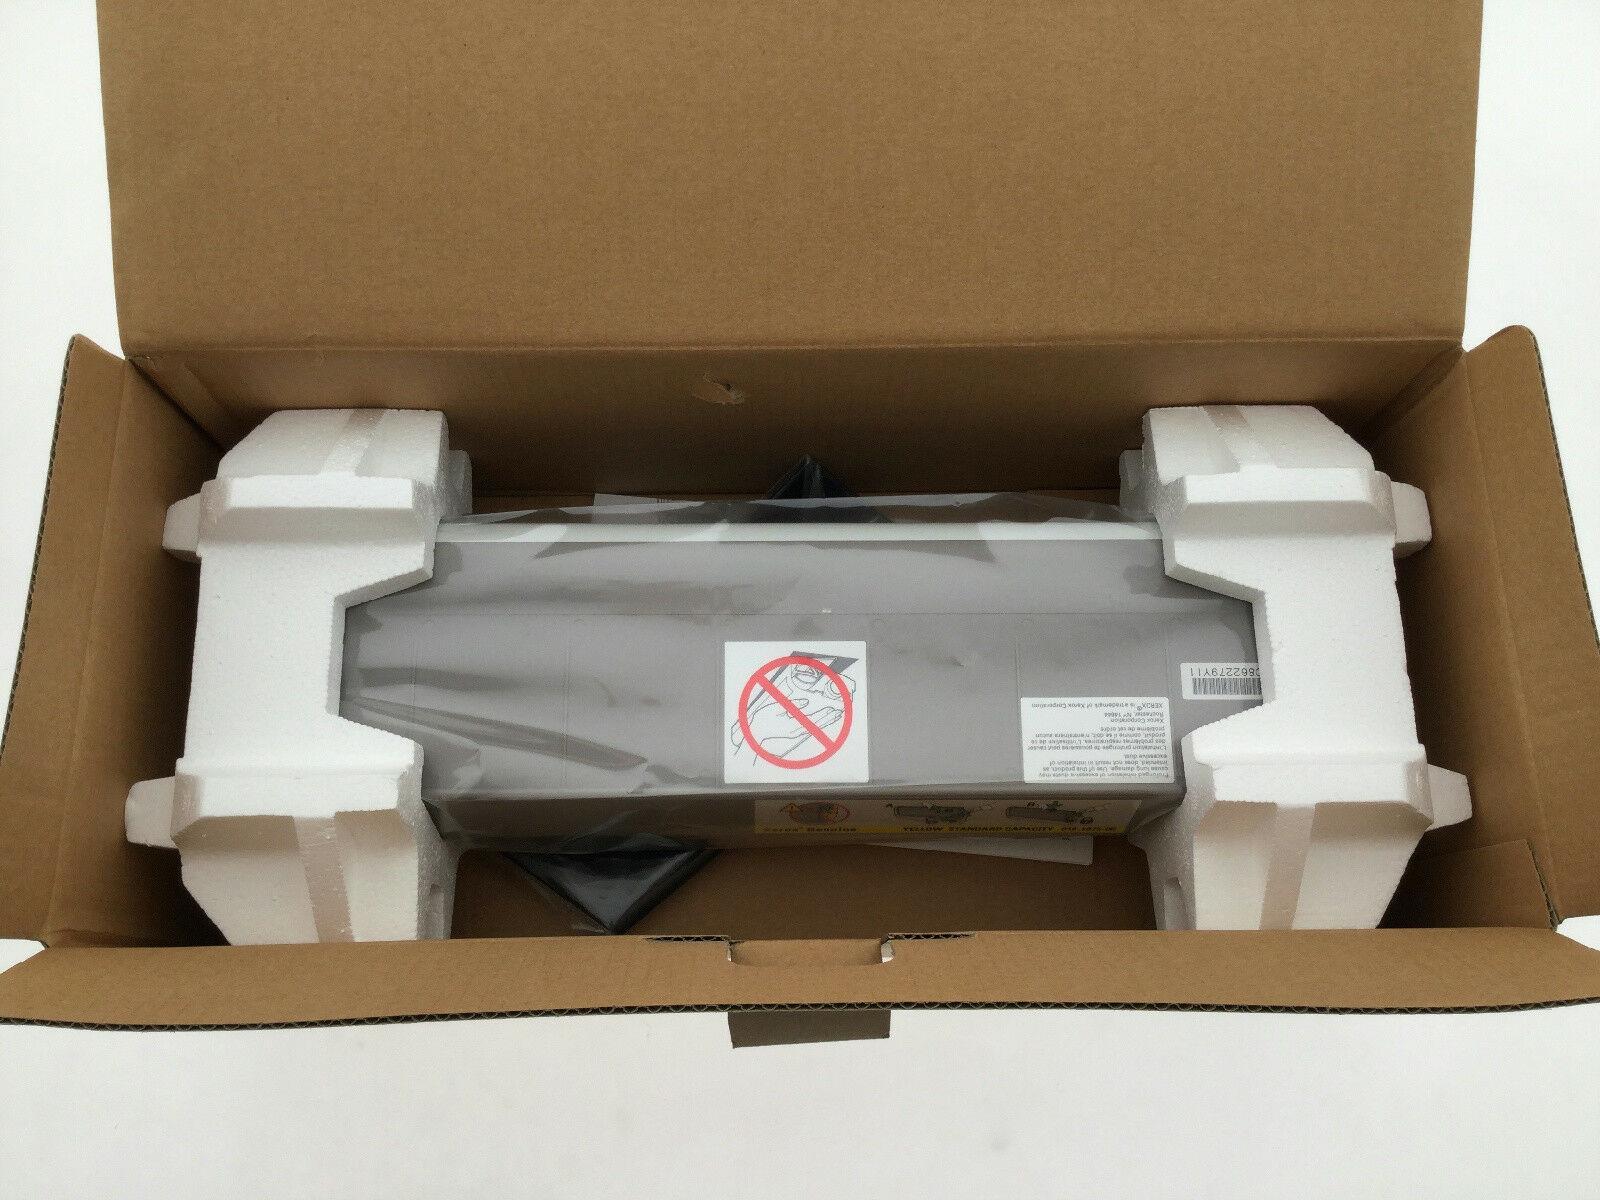 XEROX PHASER 7300 7300N 7300DN TONER CARTRIDGE SET OF 4